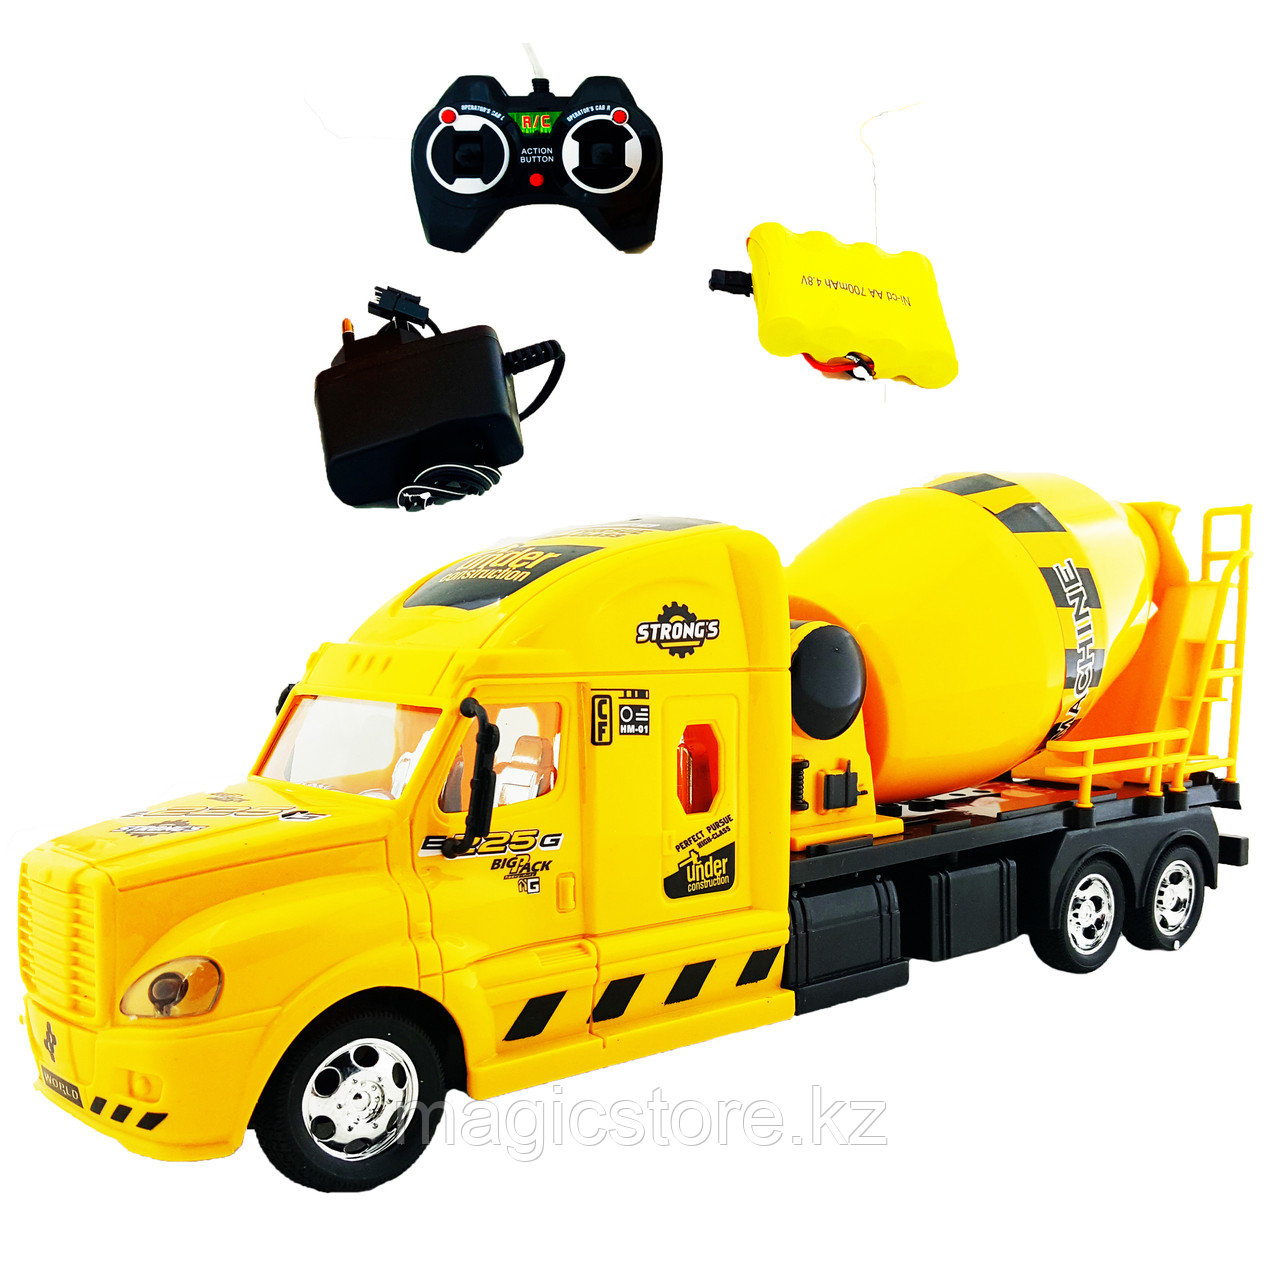 Truck Trailblazer R/C Trough Tipper Спецтехника Радиоуправляемая Бетономешалка, звук и свет - фото 1